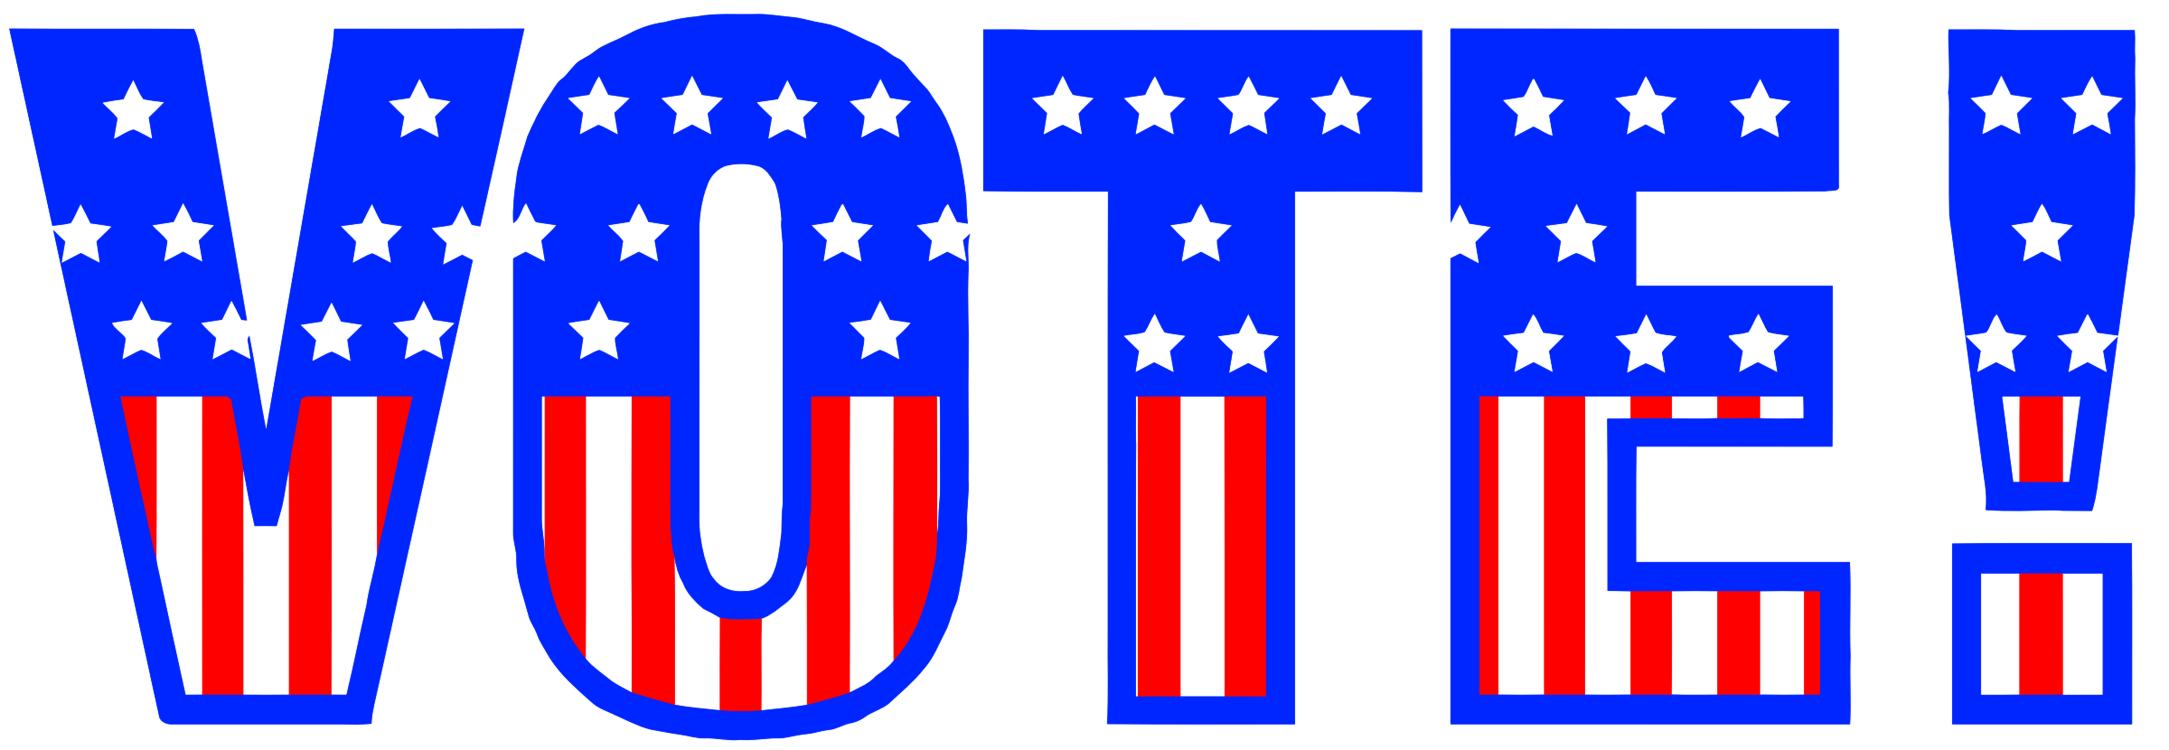 Election clipart voter registration. Blue angle symmetry png